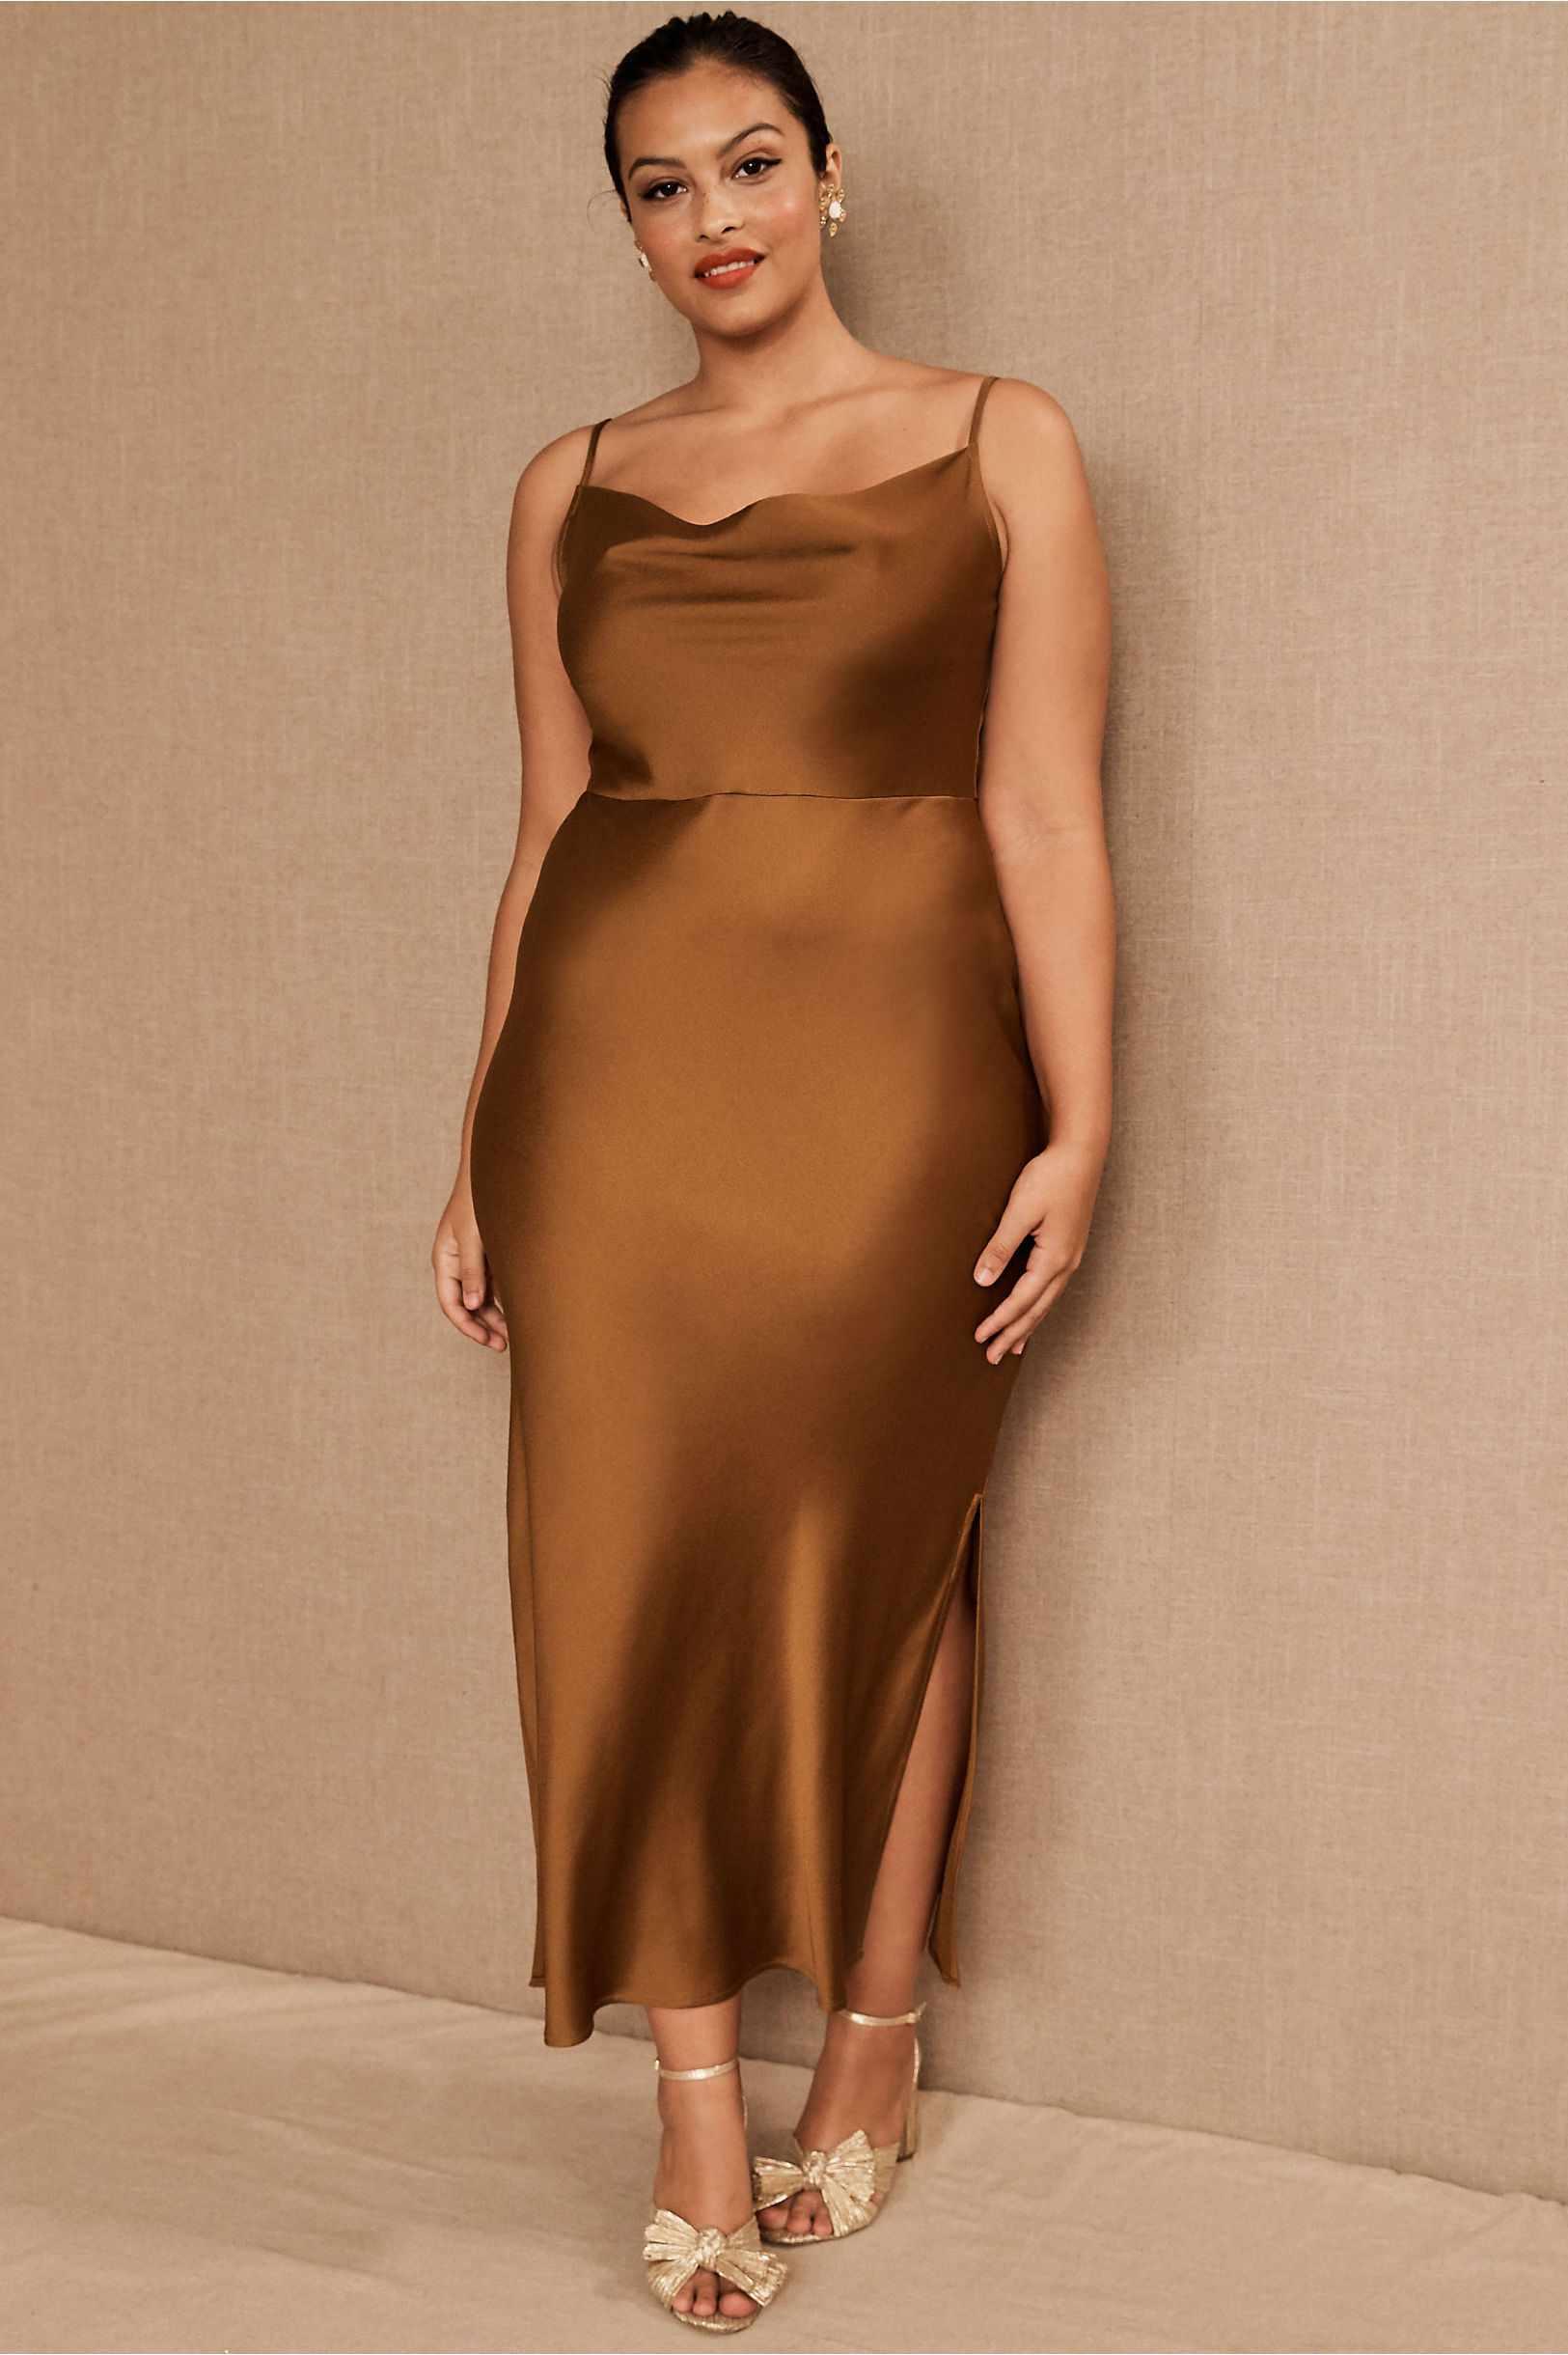 BHLDN Cali Satin Midi Dress, $168